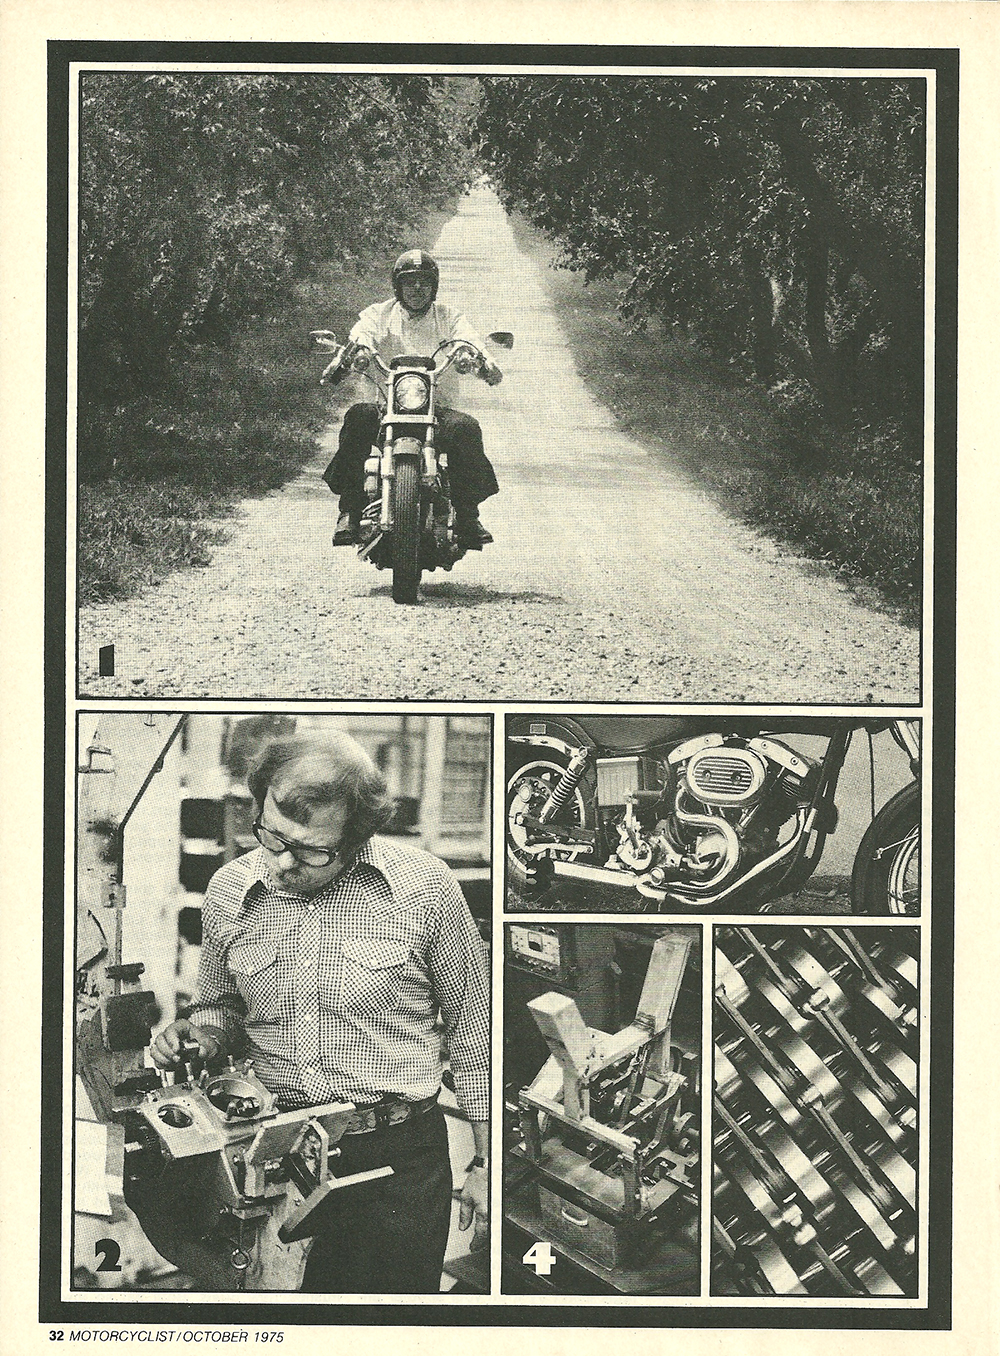 1976 Harley Super Glide Liberty Edition article 6.jpg